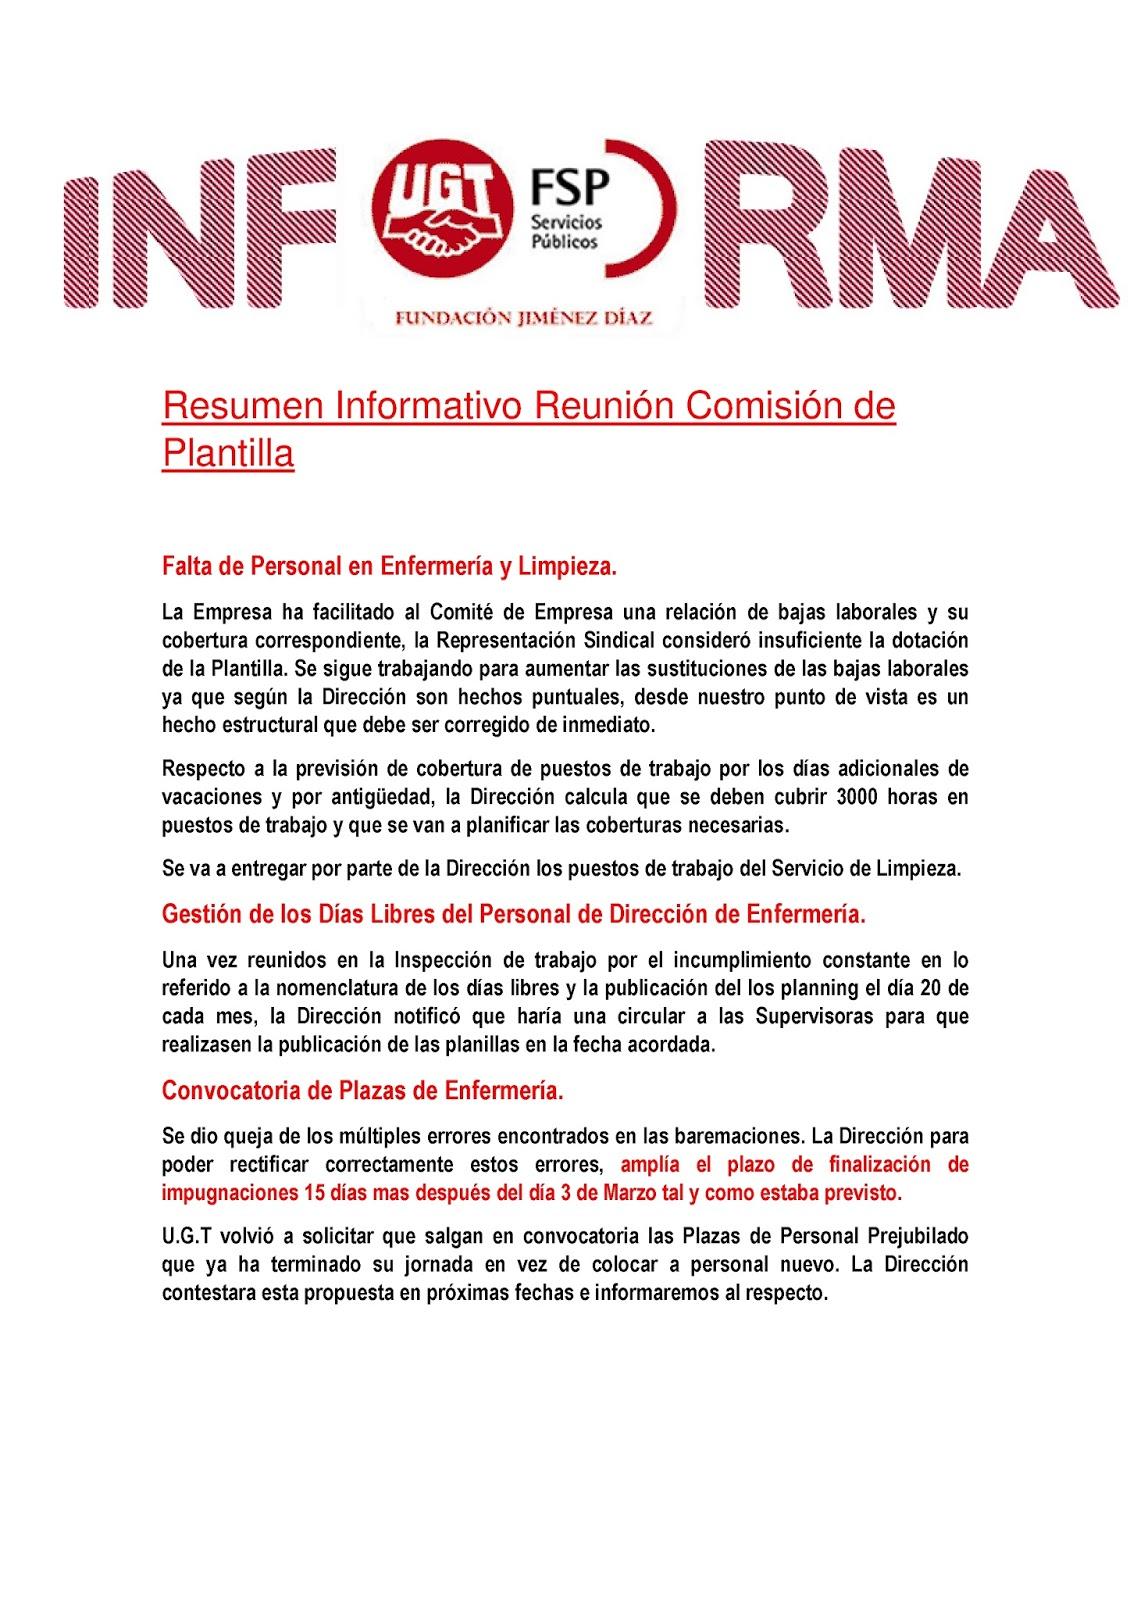 RESUMEN REUNION COMISION DE PLANTILLA